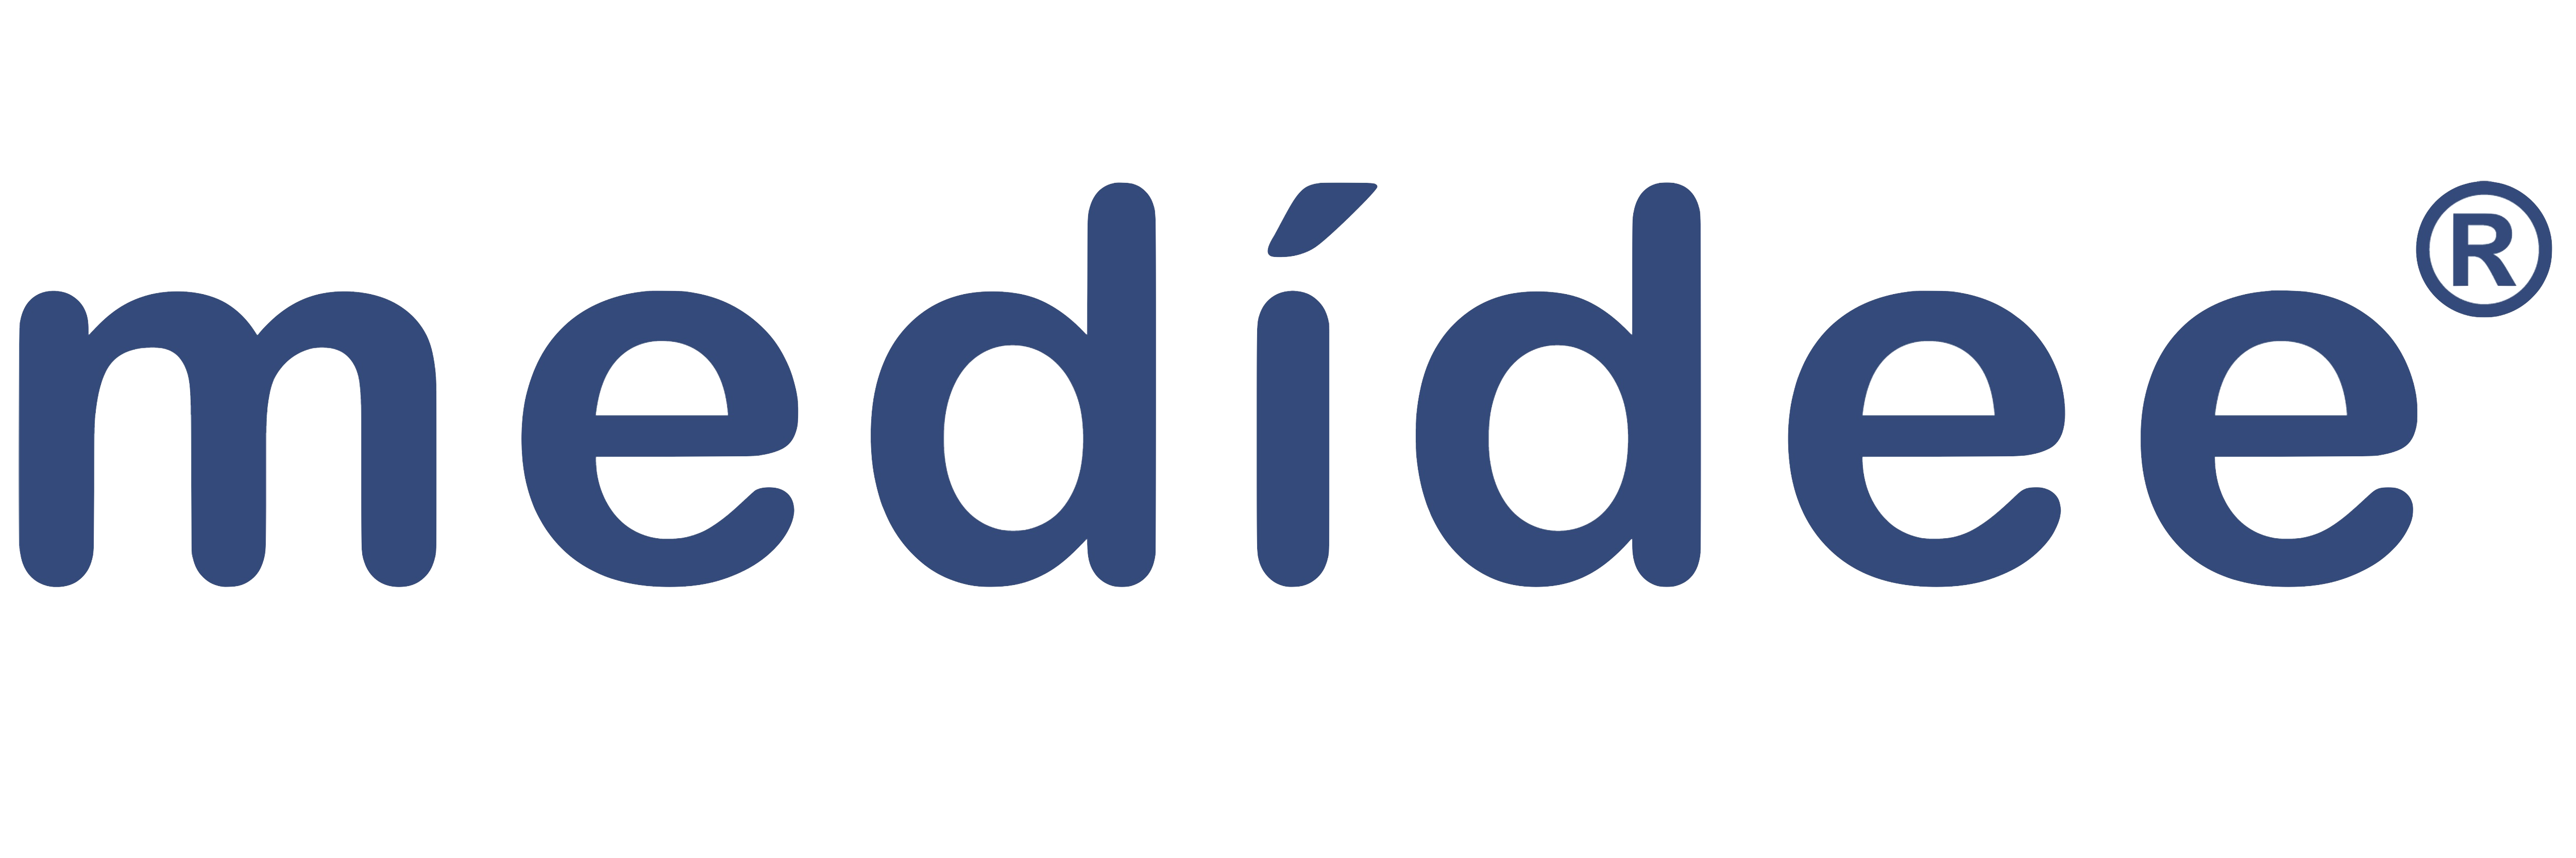 Logo Medidee HR transparent 5000x1666.png